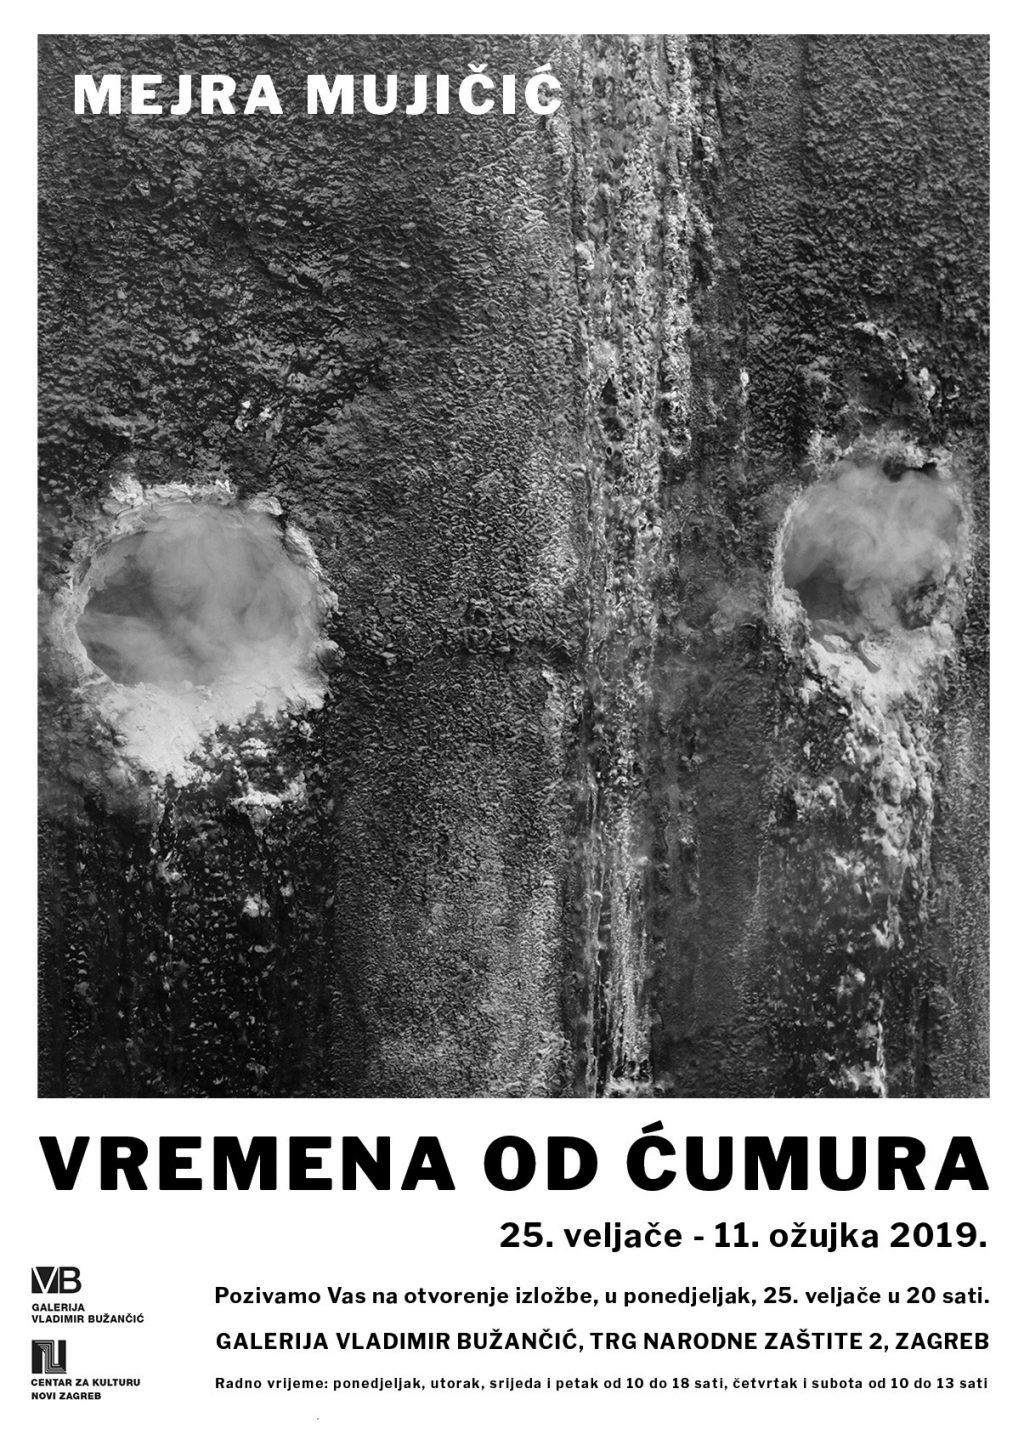 jasenovac i gradiška stara lyrics